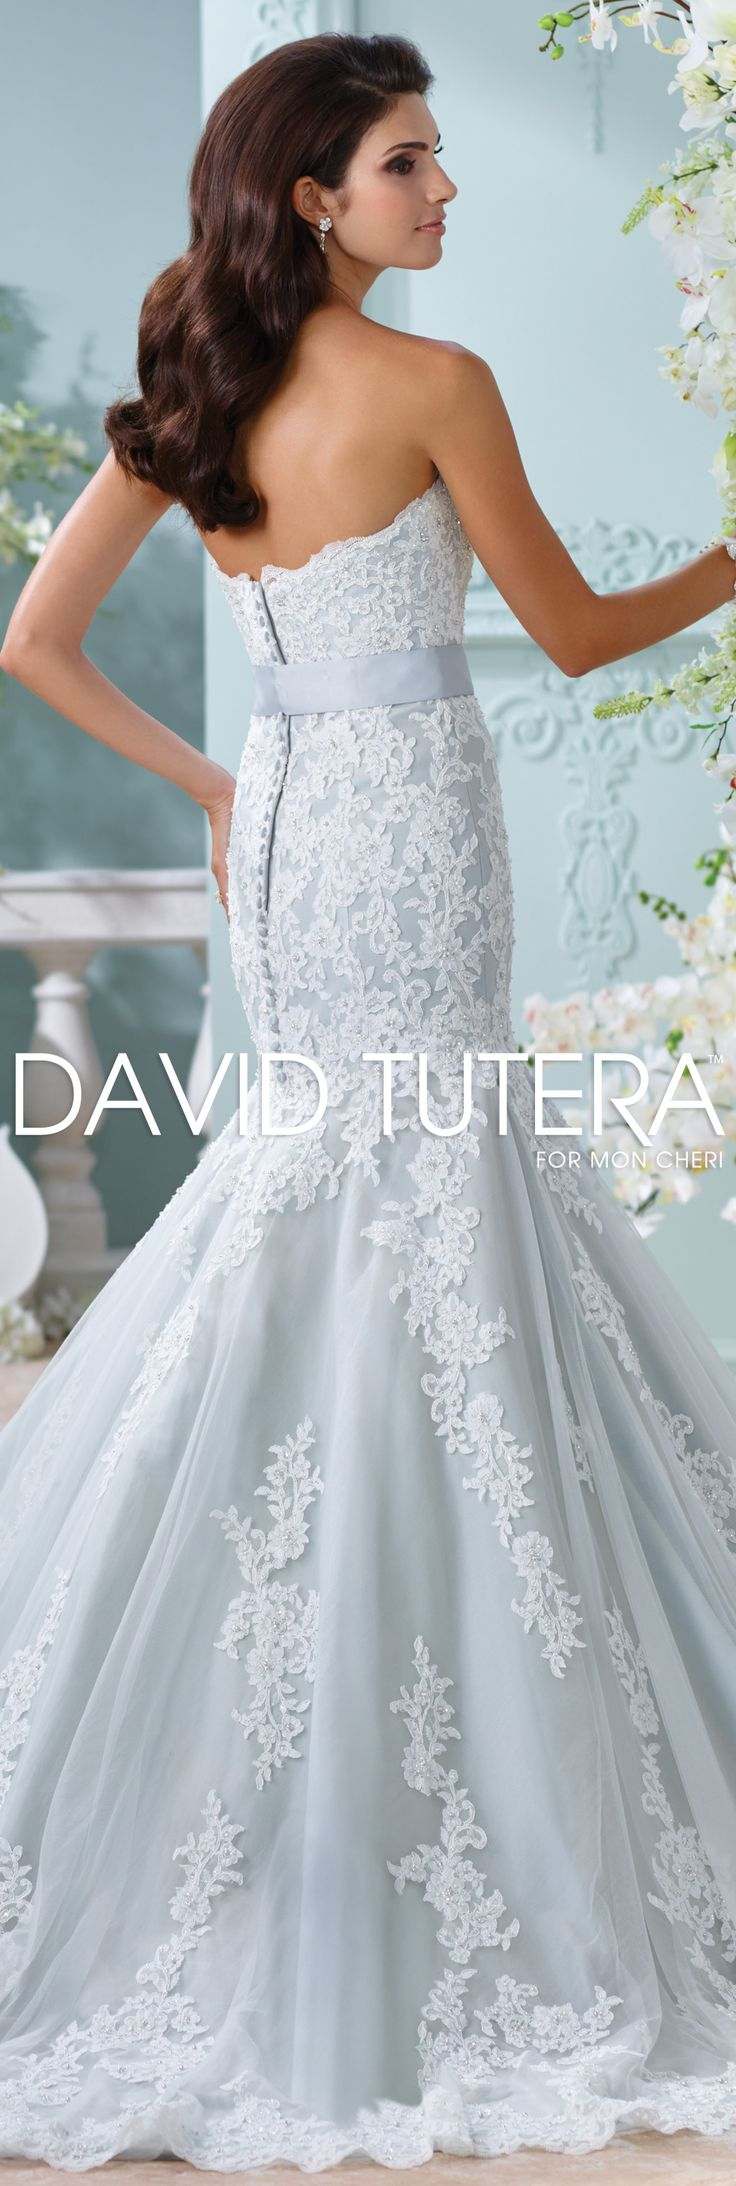 418 best Blue Weddings images on Pinterest | Light blue, Blues and ...